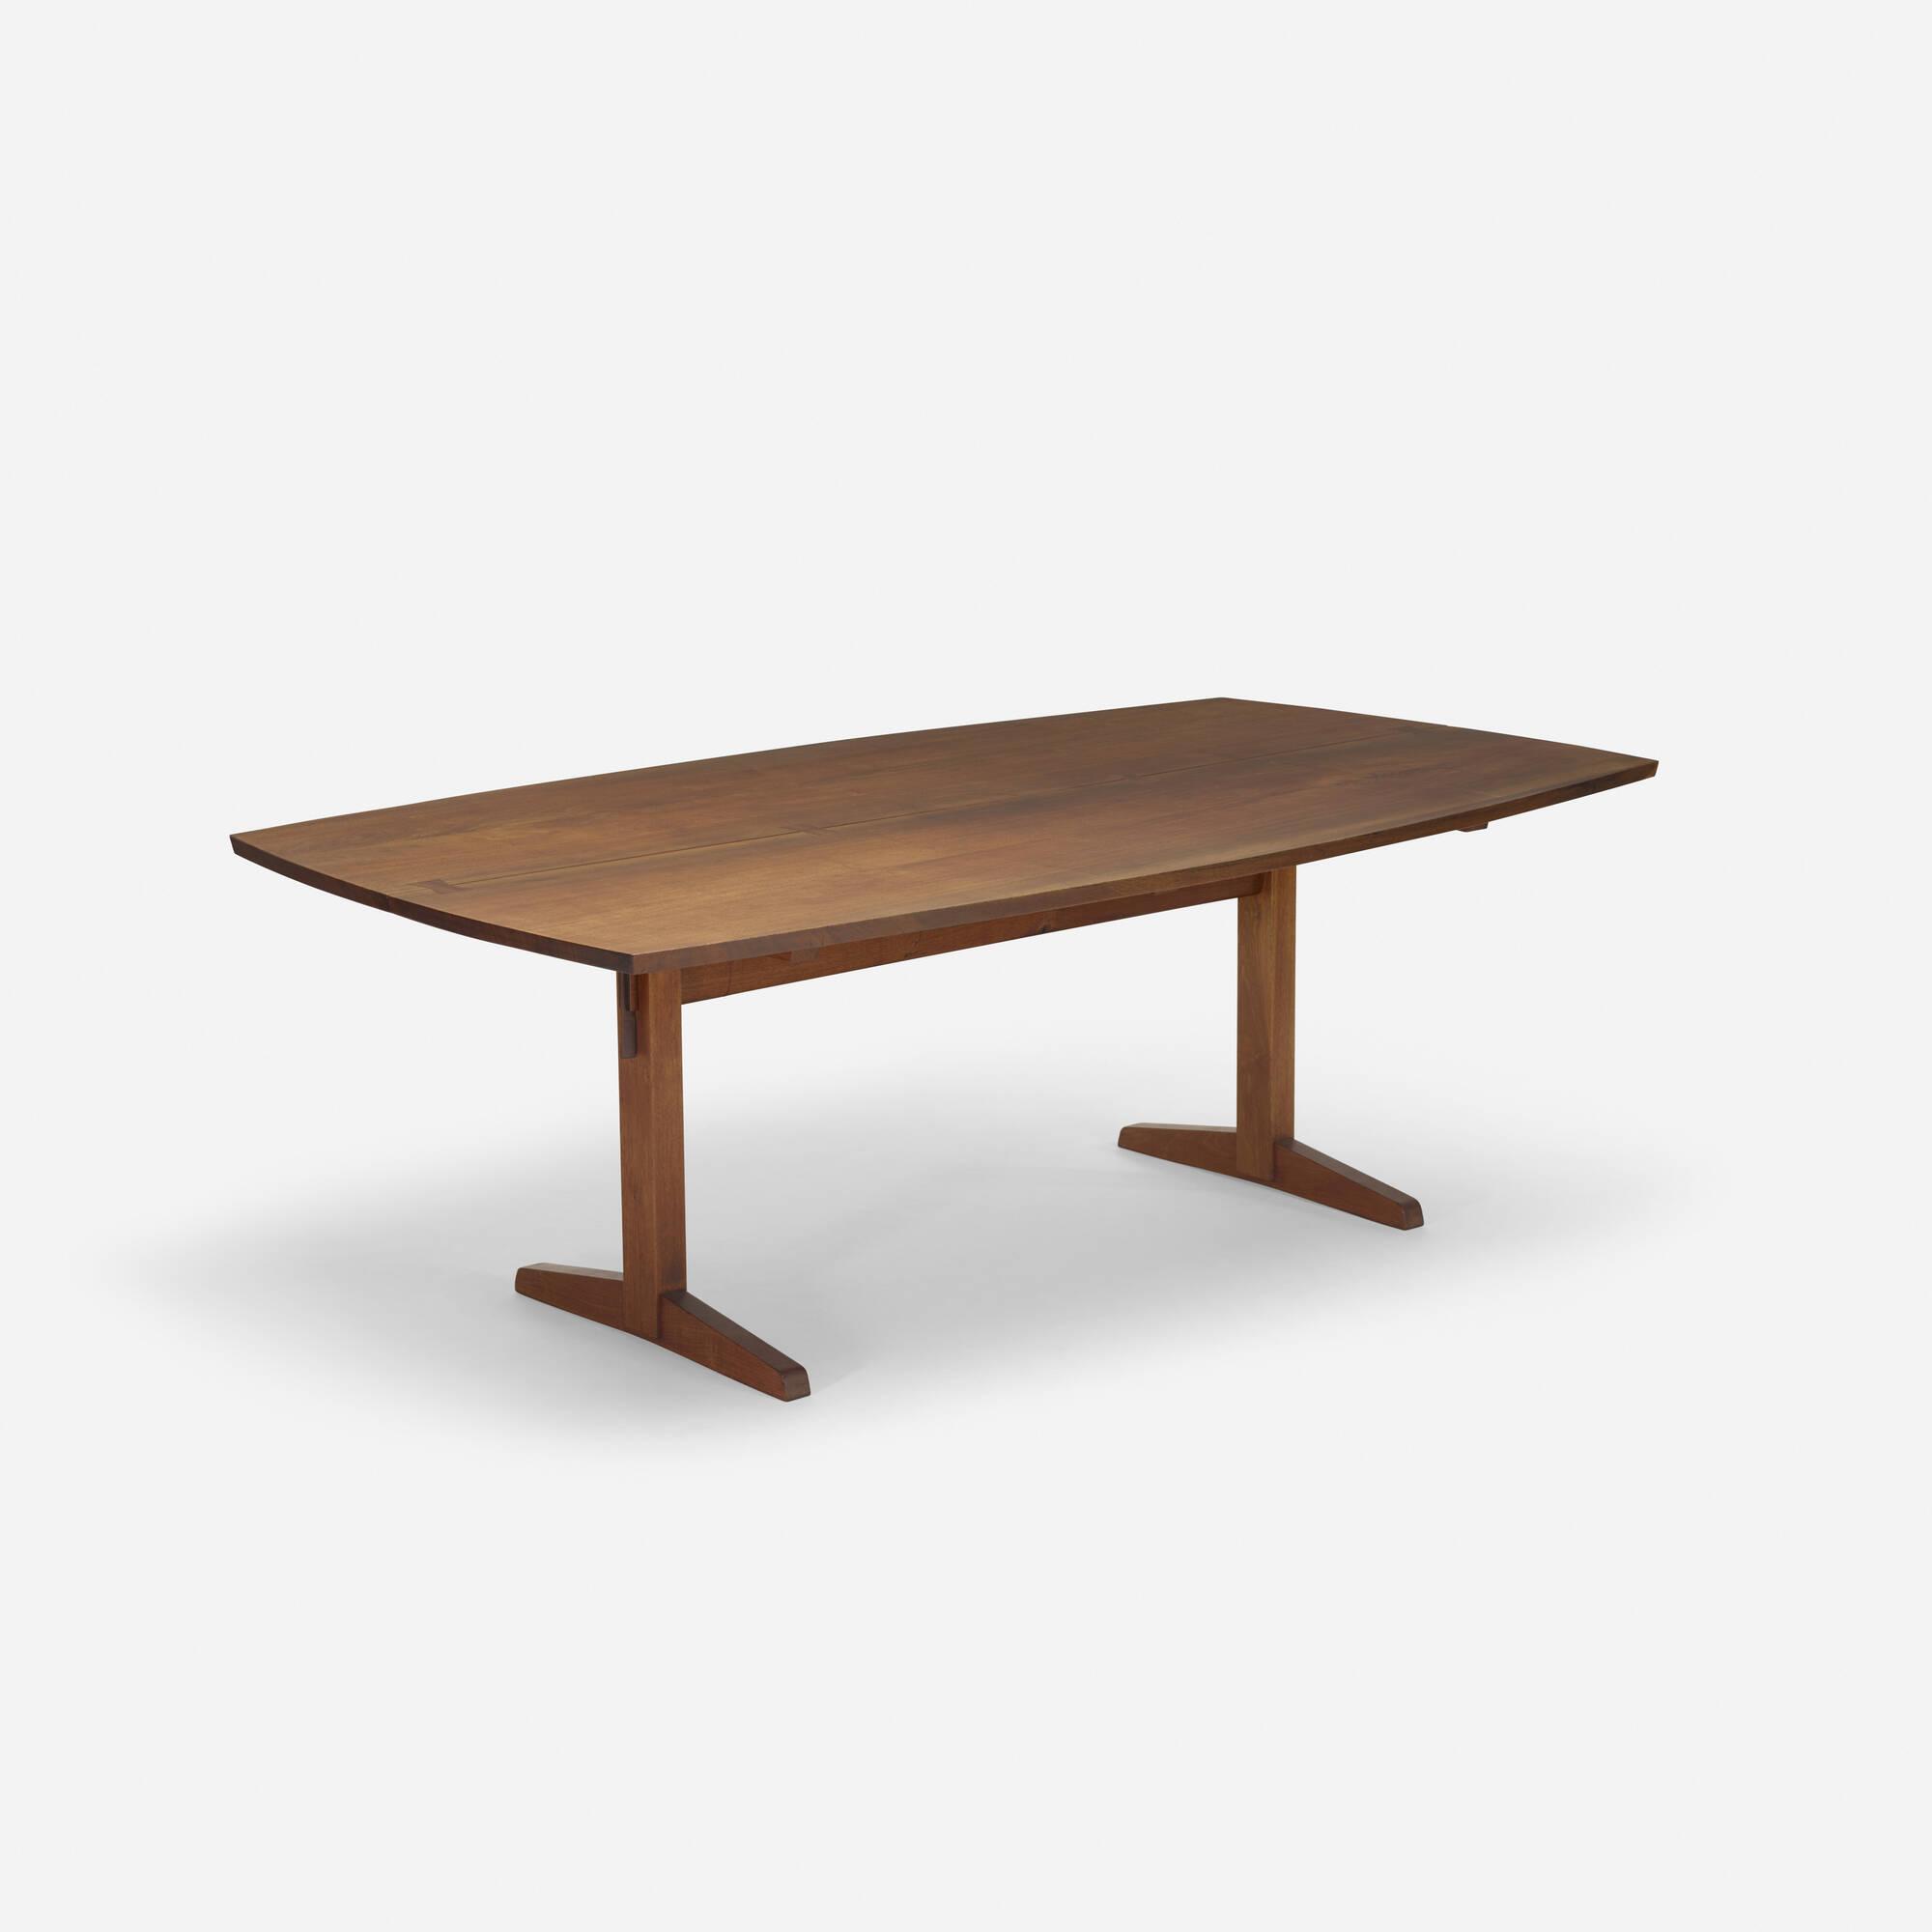 123 George Nakashima Trestle dining table Design 8 December